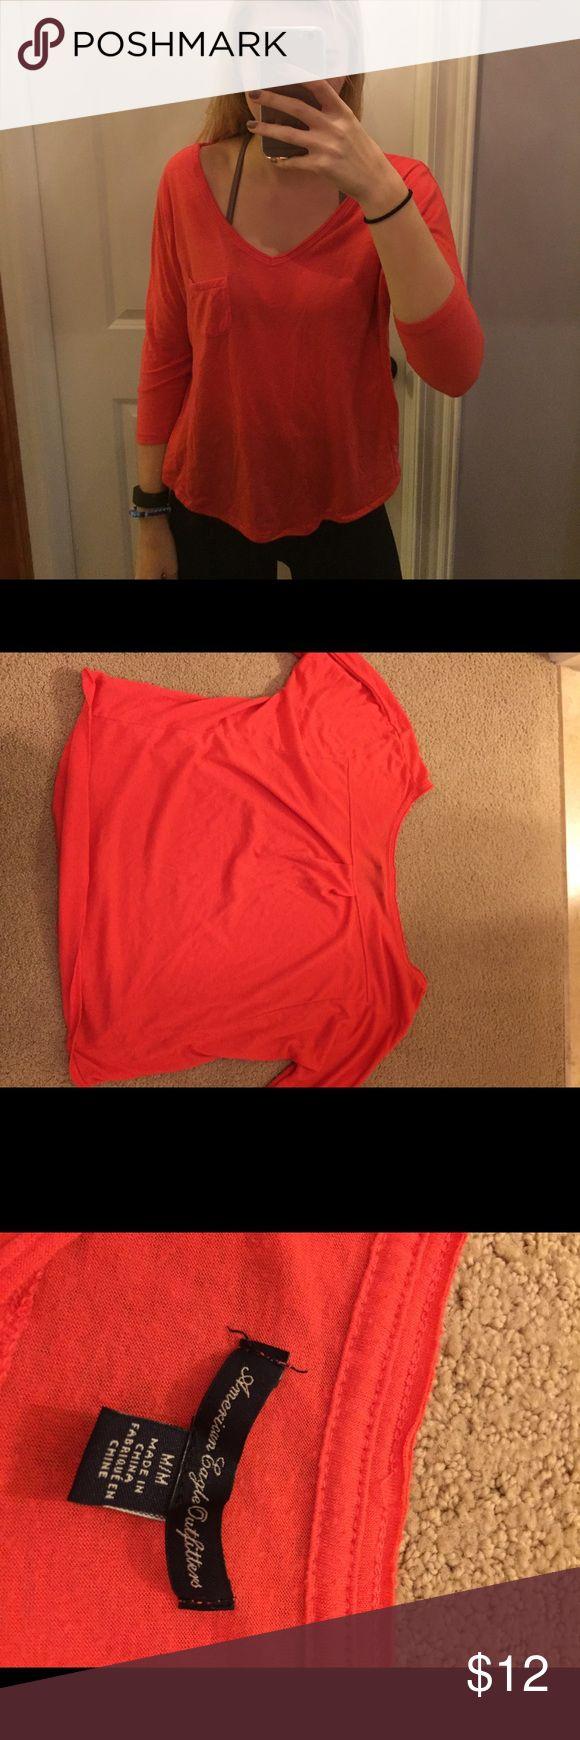 Orange tee Orange tee with three quarter length sleeves American Eagle Outfitters Tops Tees - Long Sleeve